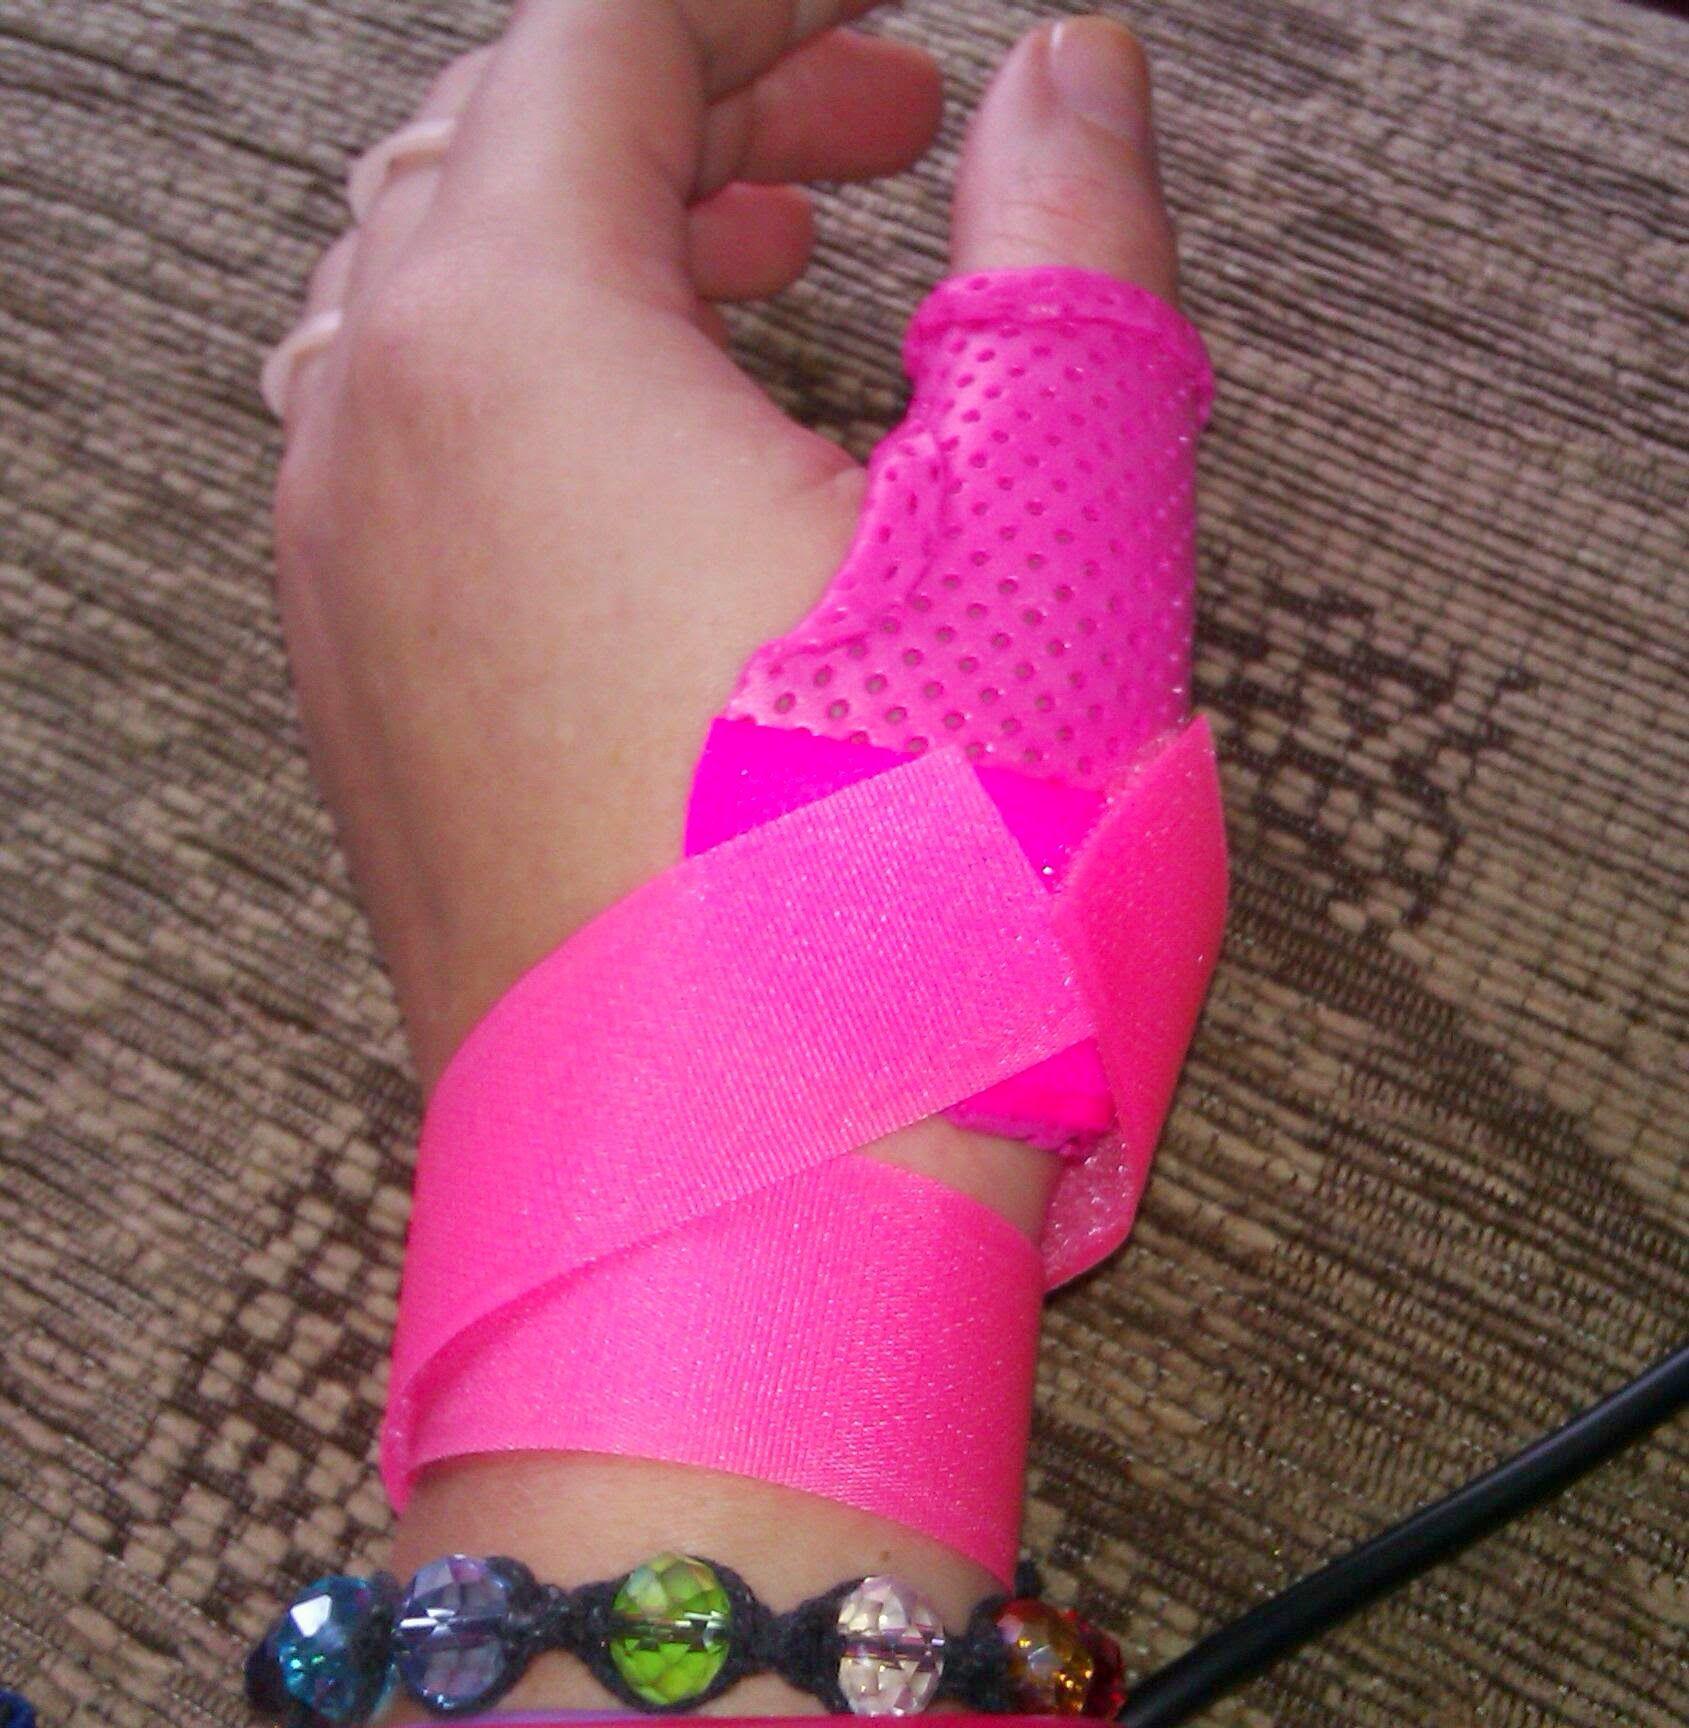 Thermoplastic thumb spica splints joint laxity